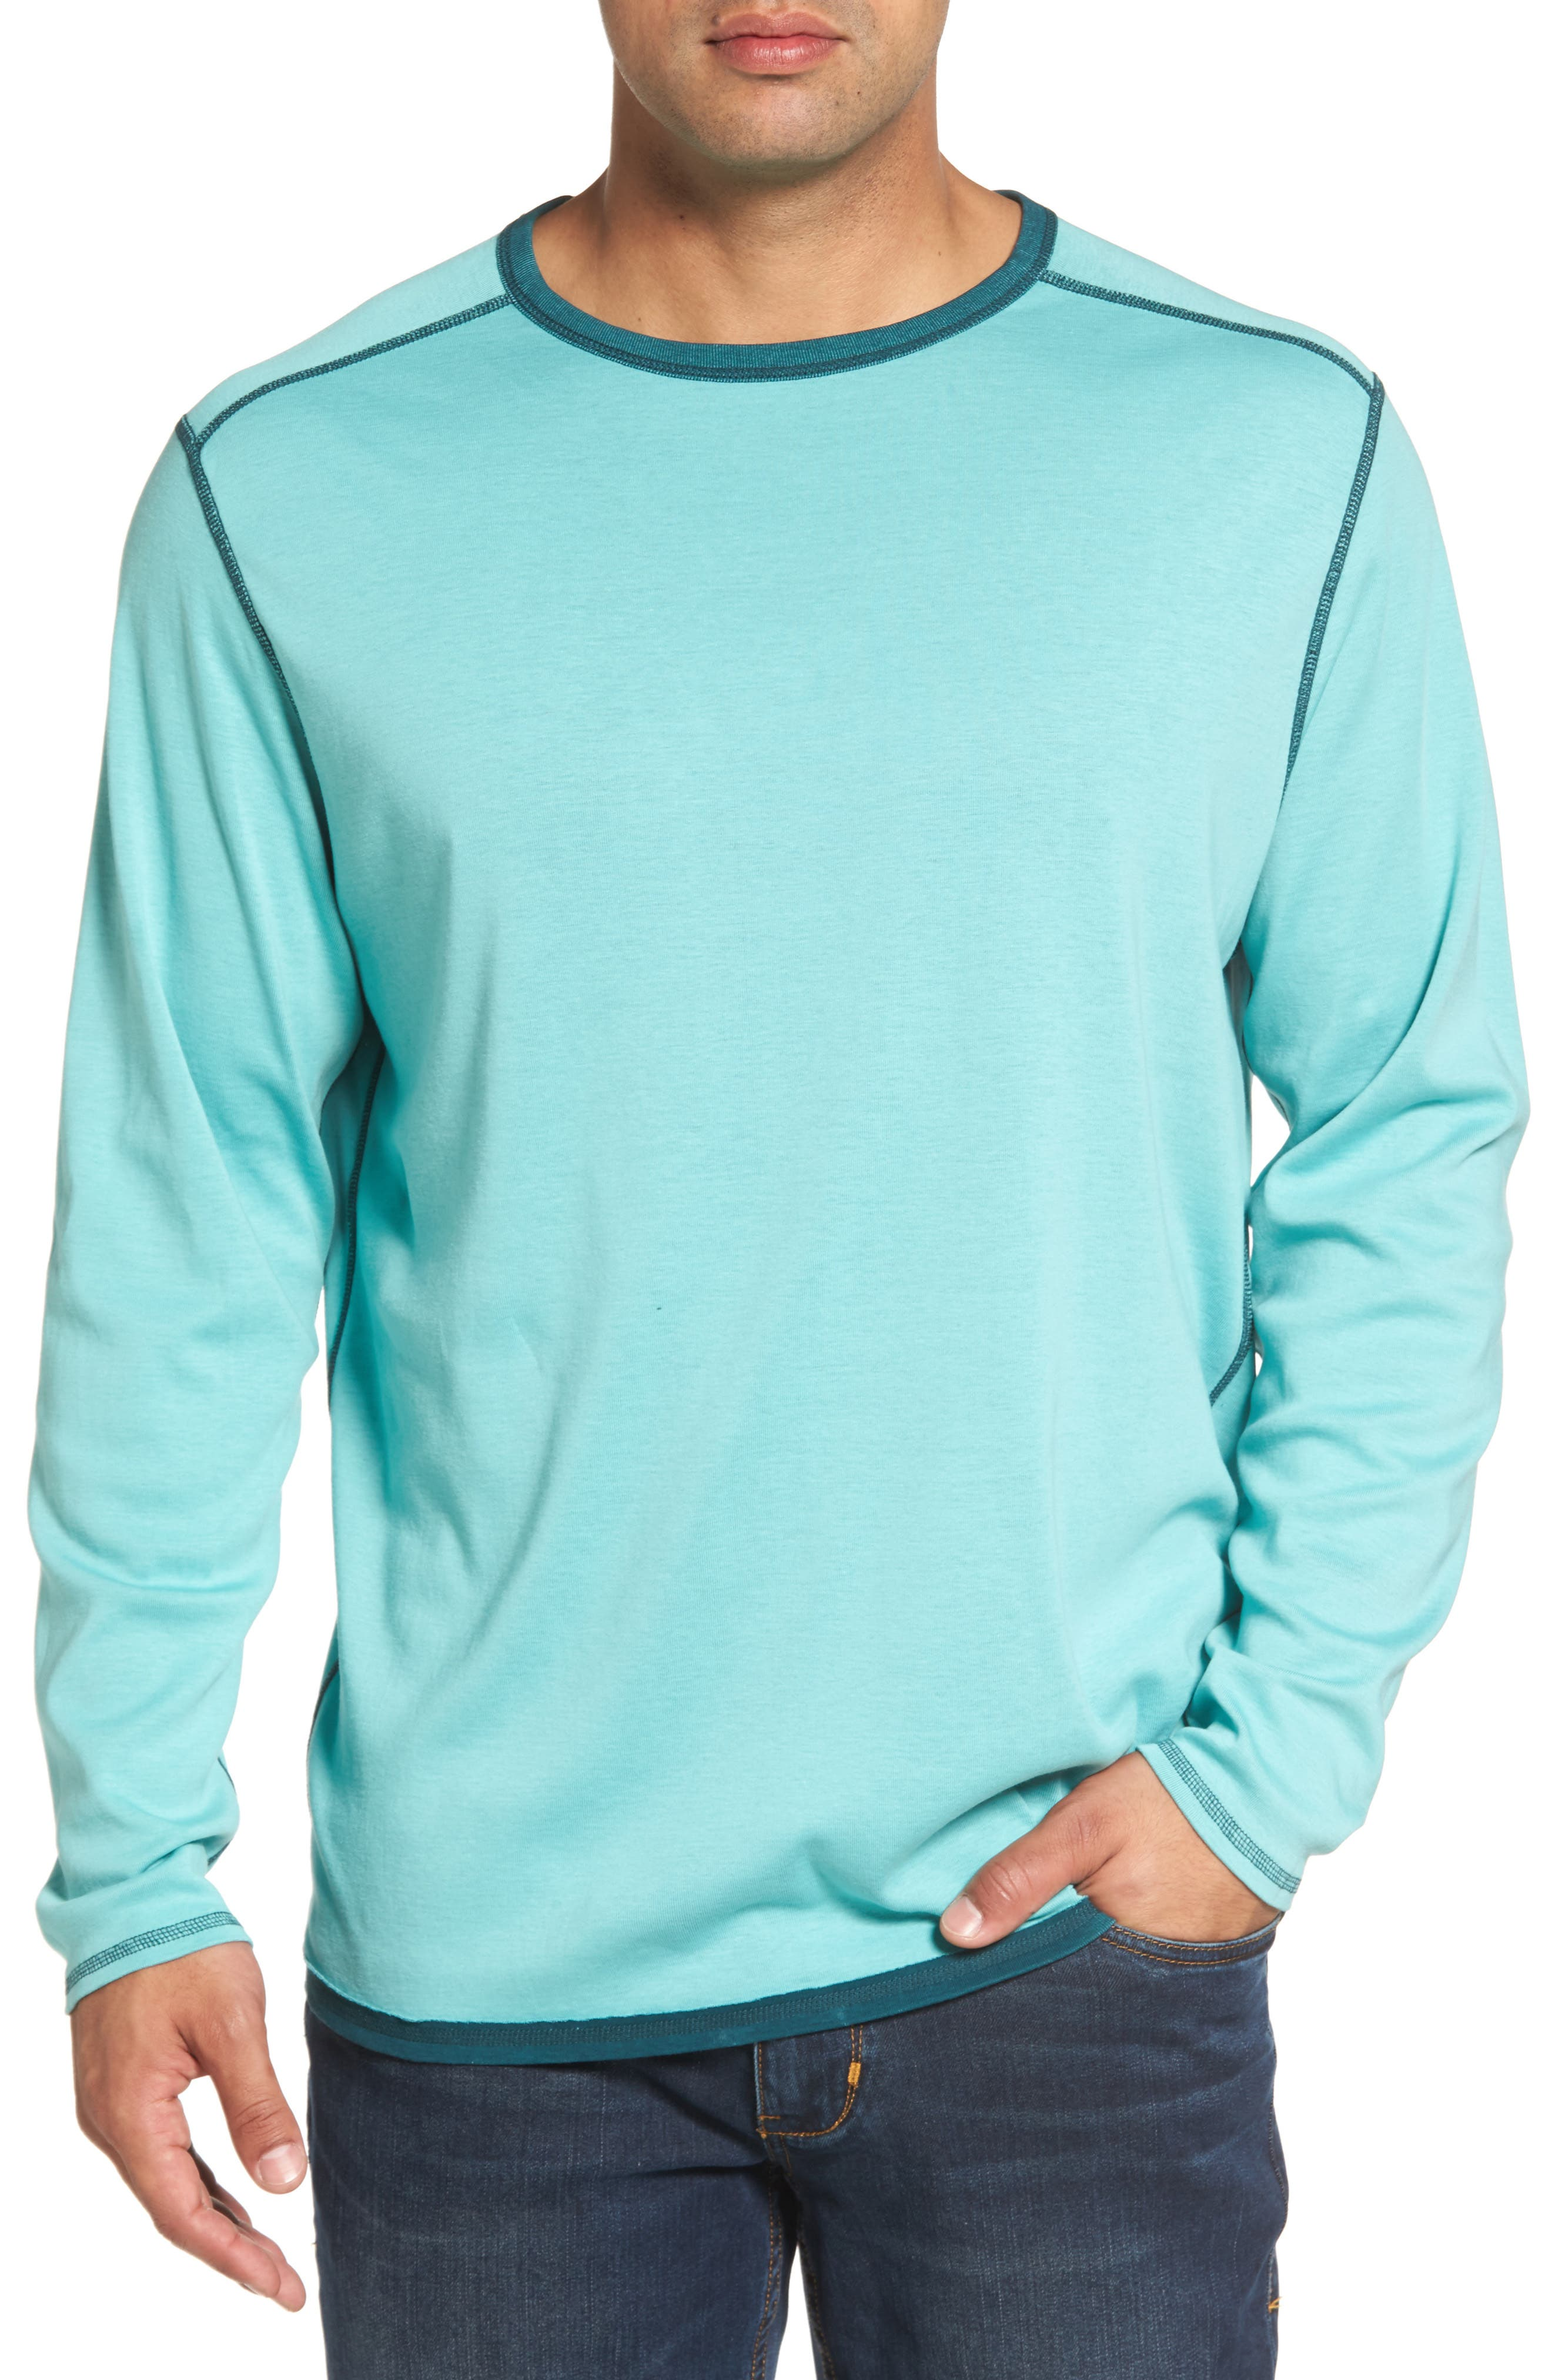 Dual in the Sun Reversible T-Shirt,                             Alternate thumbnail 4, color,                             300